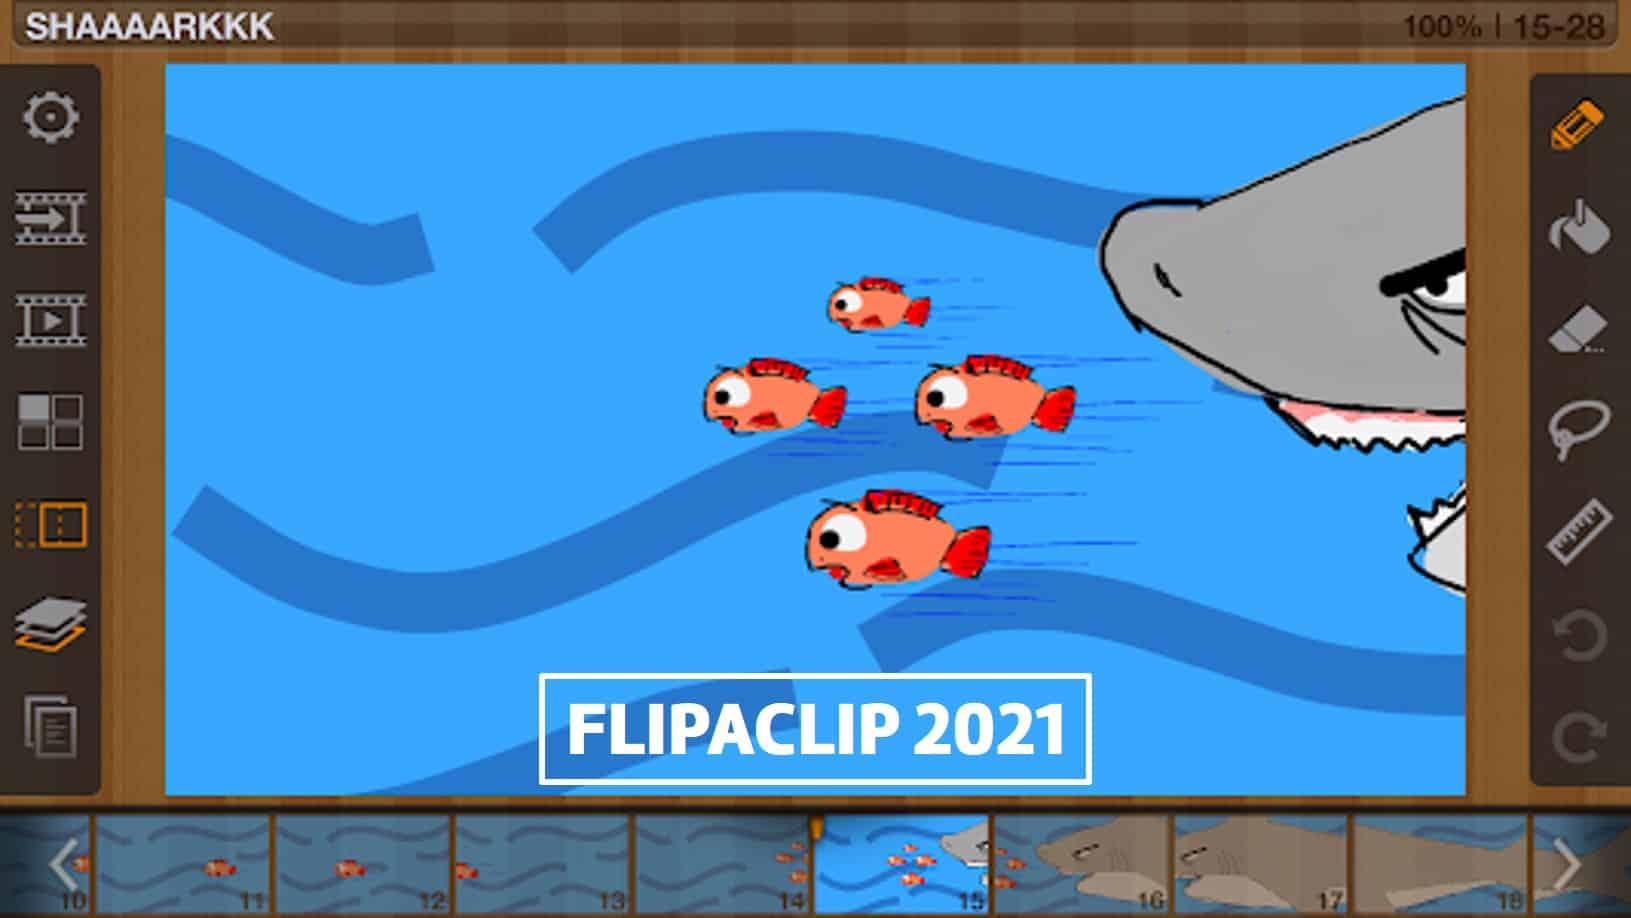 flipaclip 2021